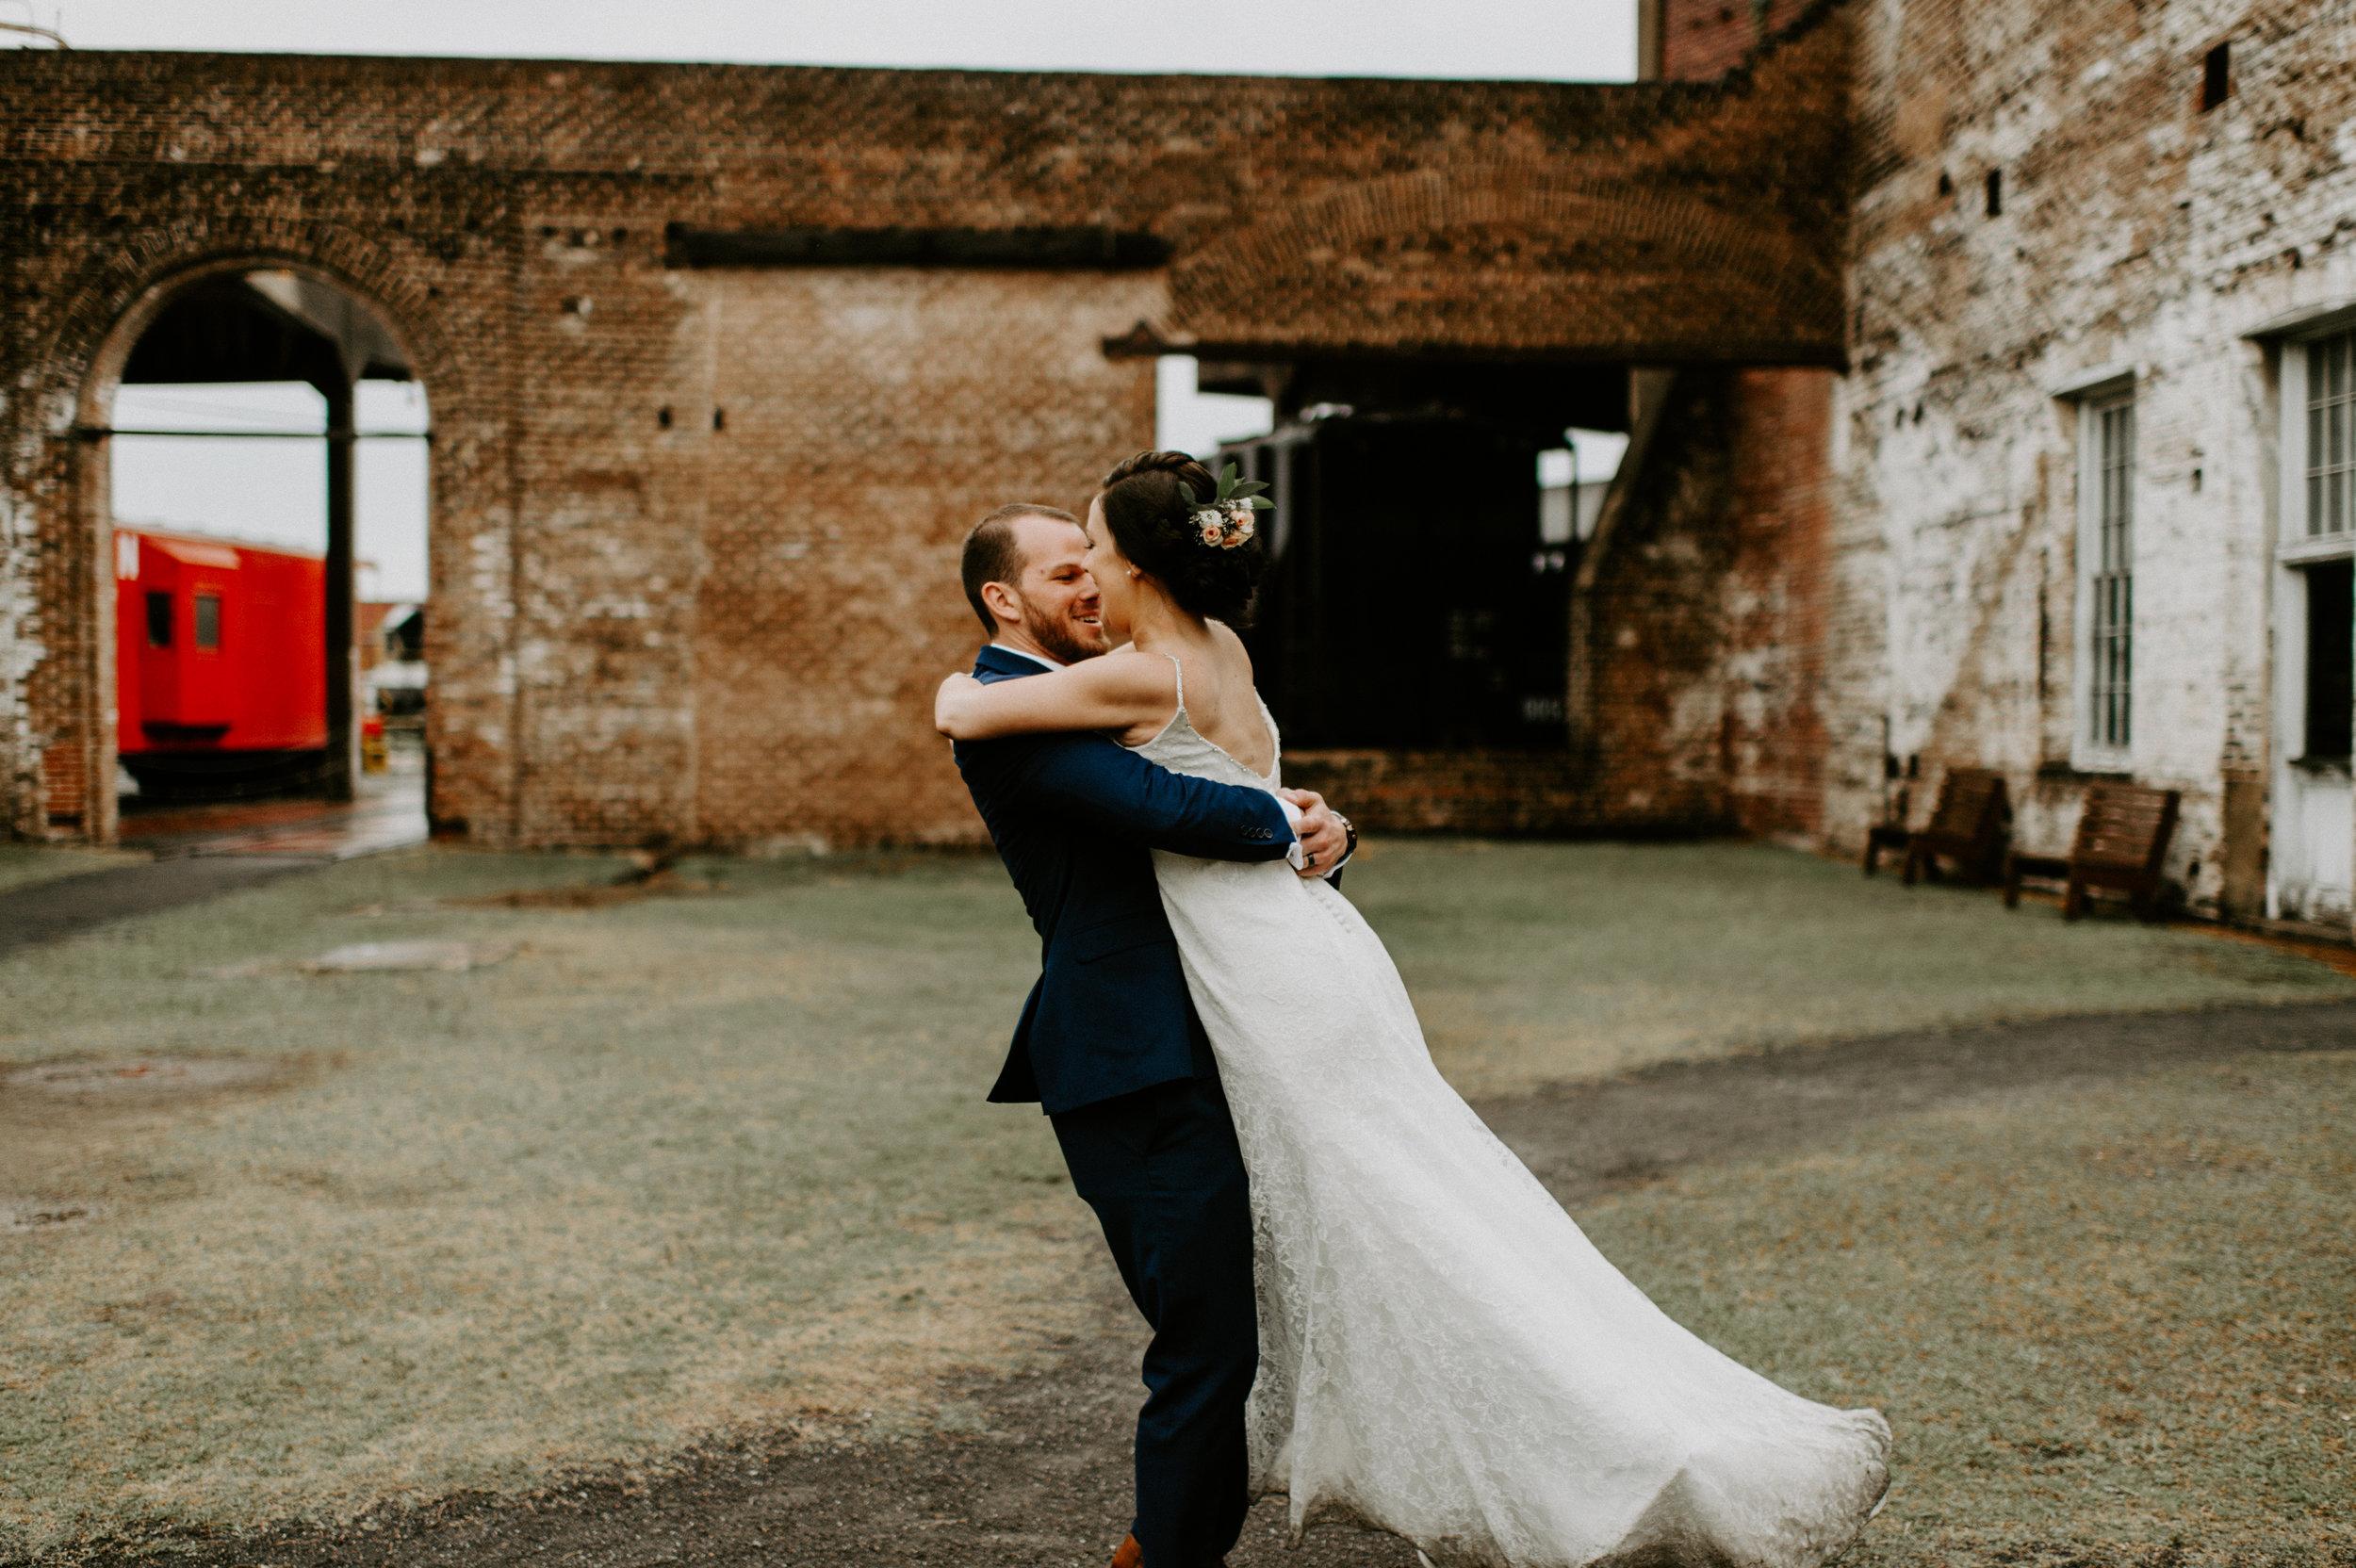 savannah-bridal-shop-andrea-and-mike-evergold-photography-georgia-state-railroad-museum-wedding-savannah-wedding-florist-savannah-wedding-planner-40.jpg